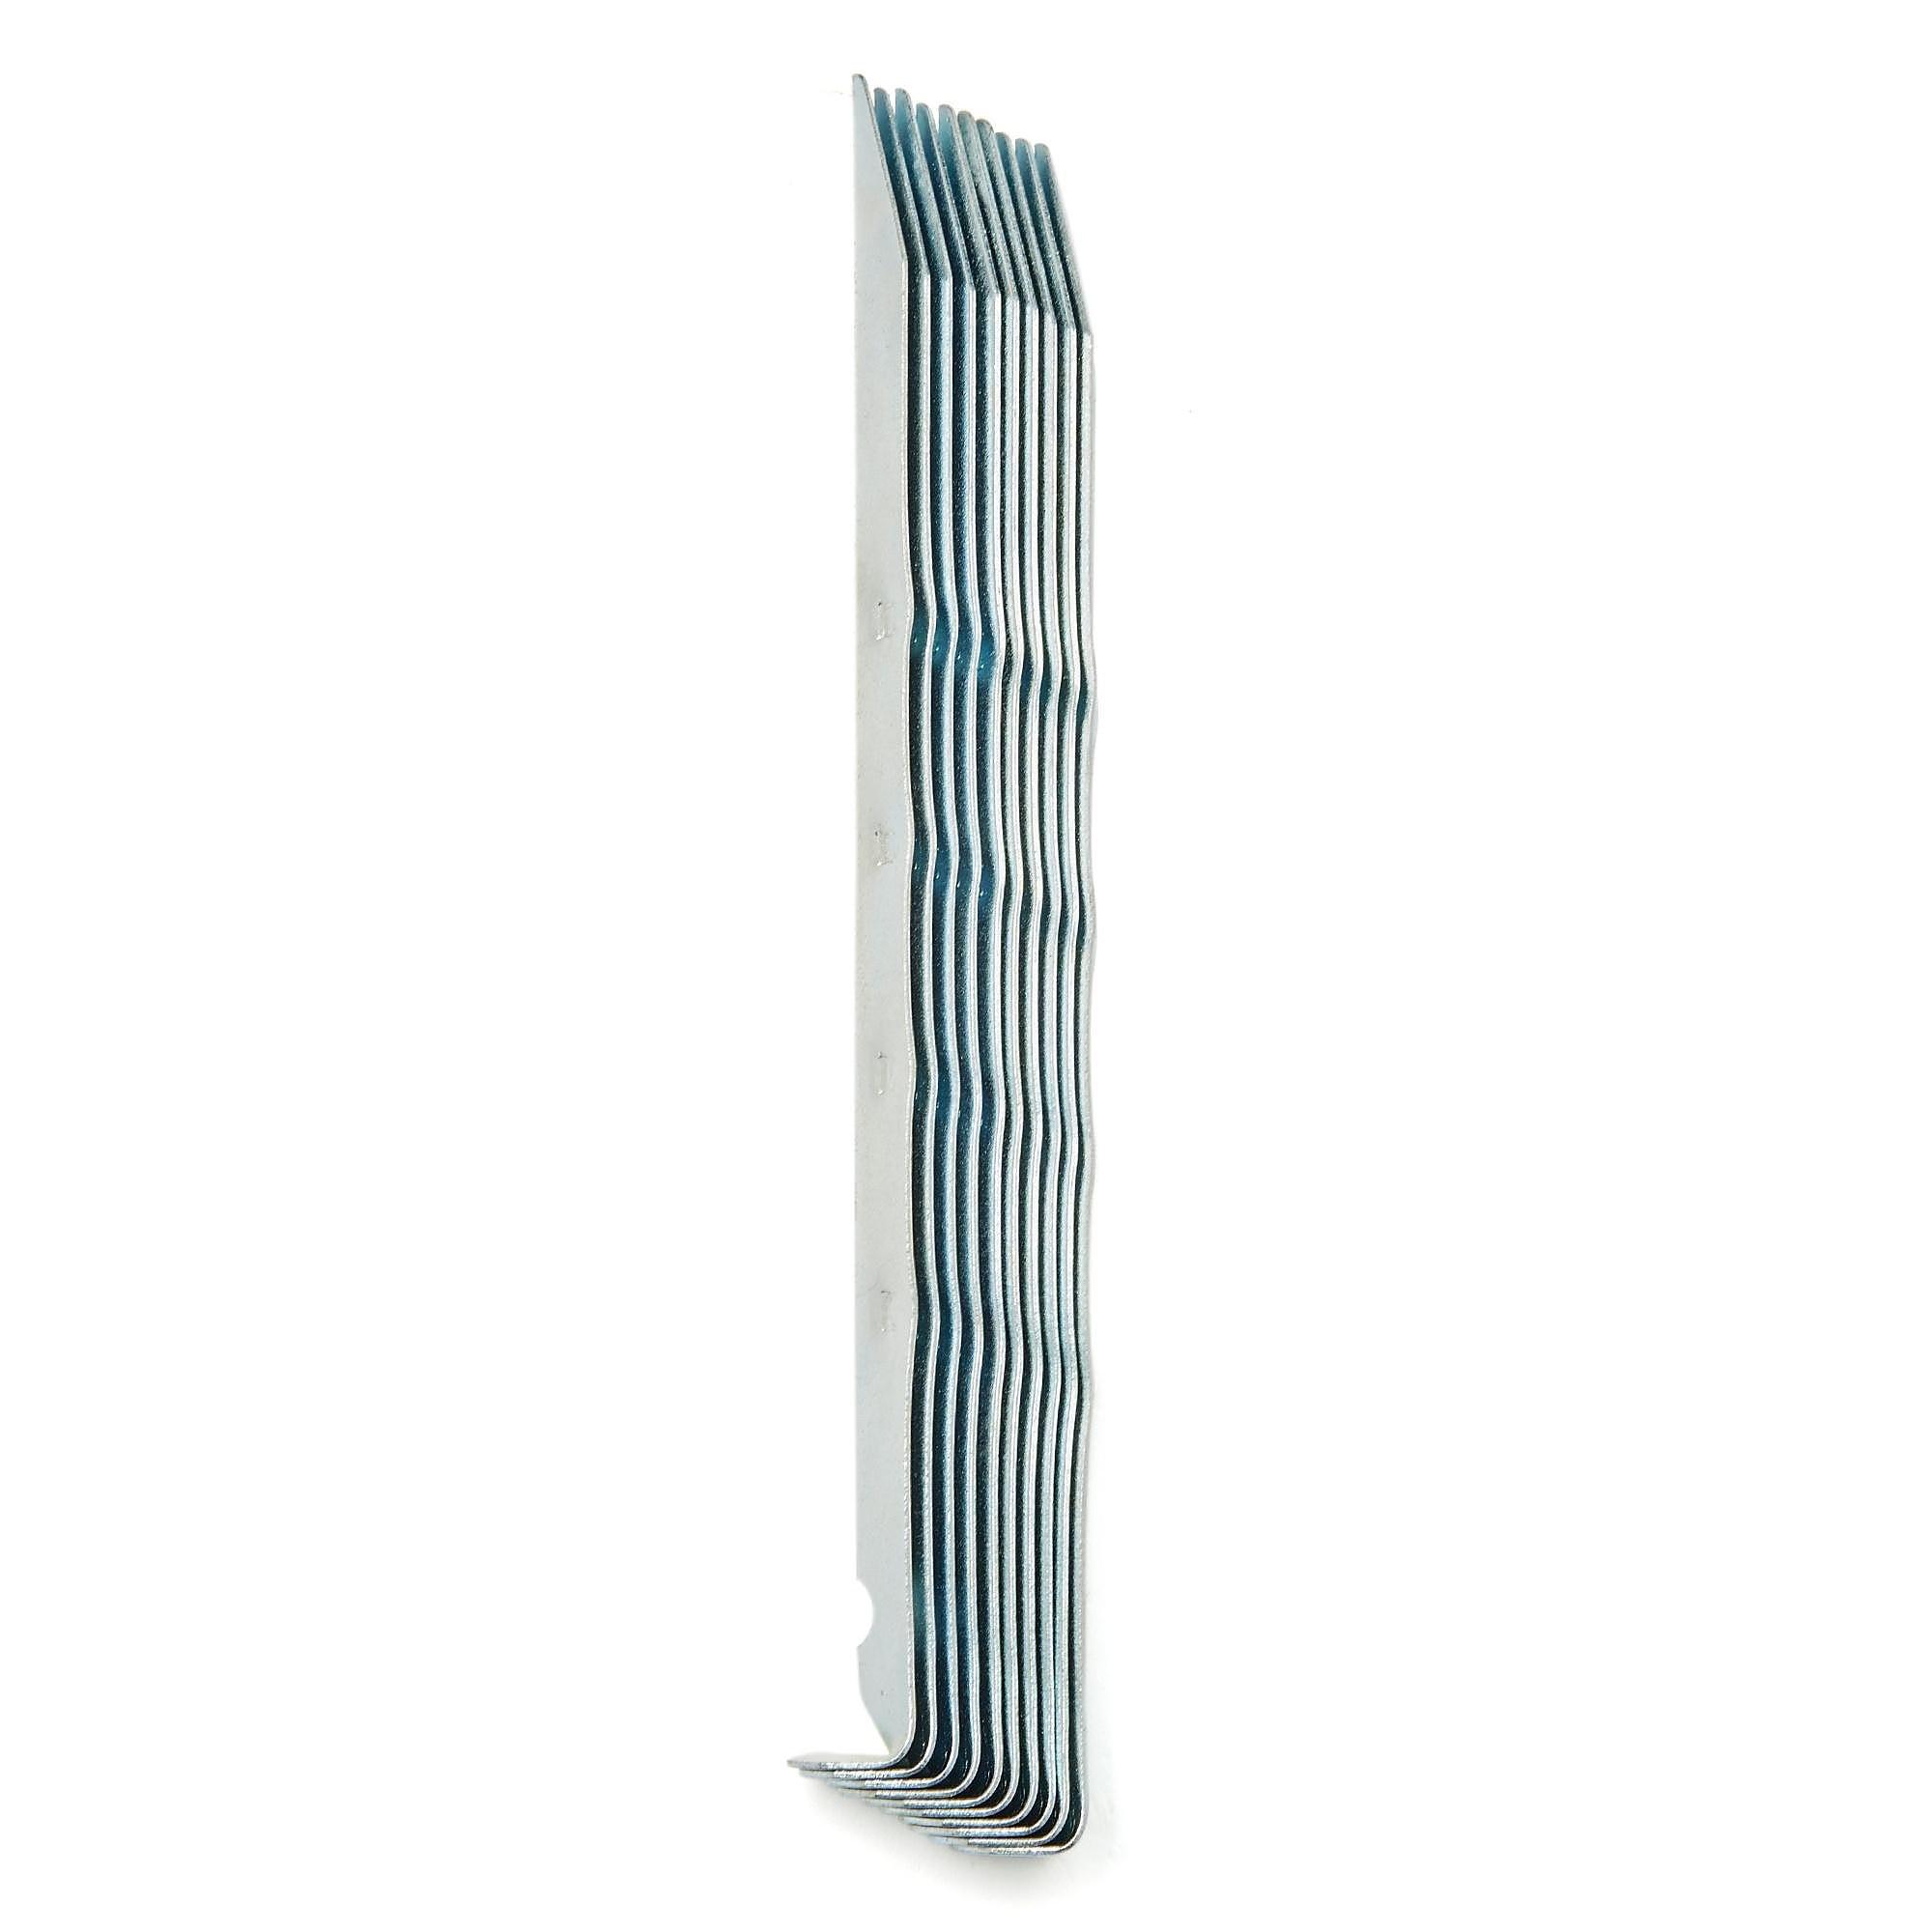 Eurohike Ripple Pegs 18cm